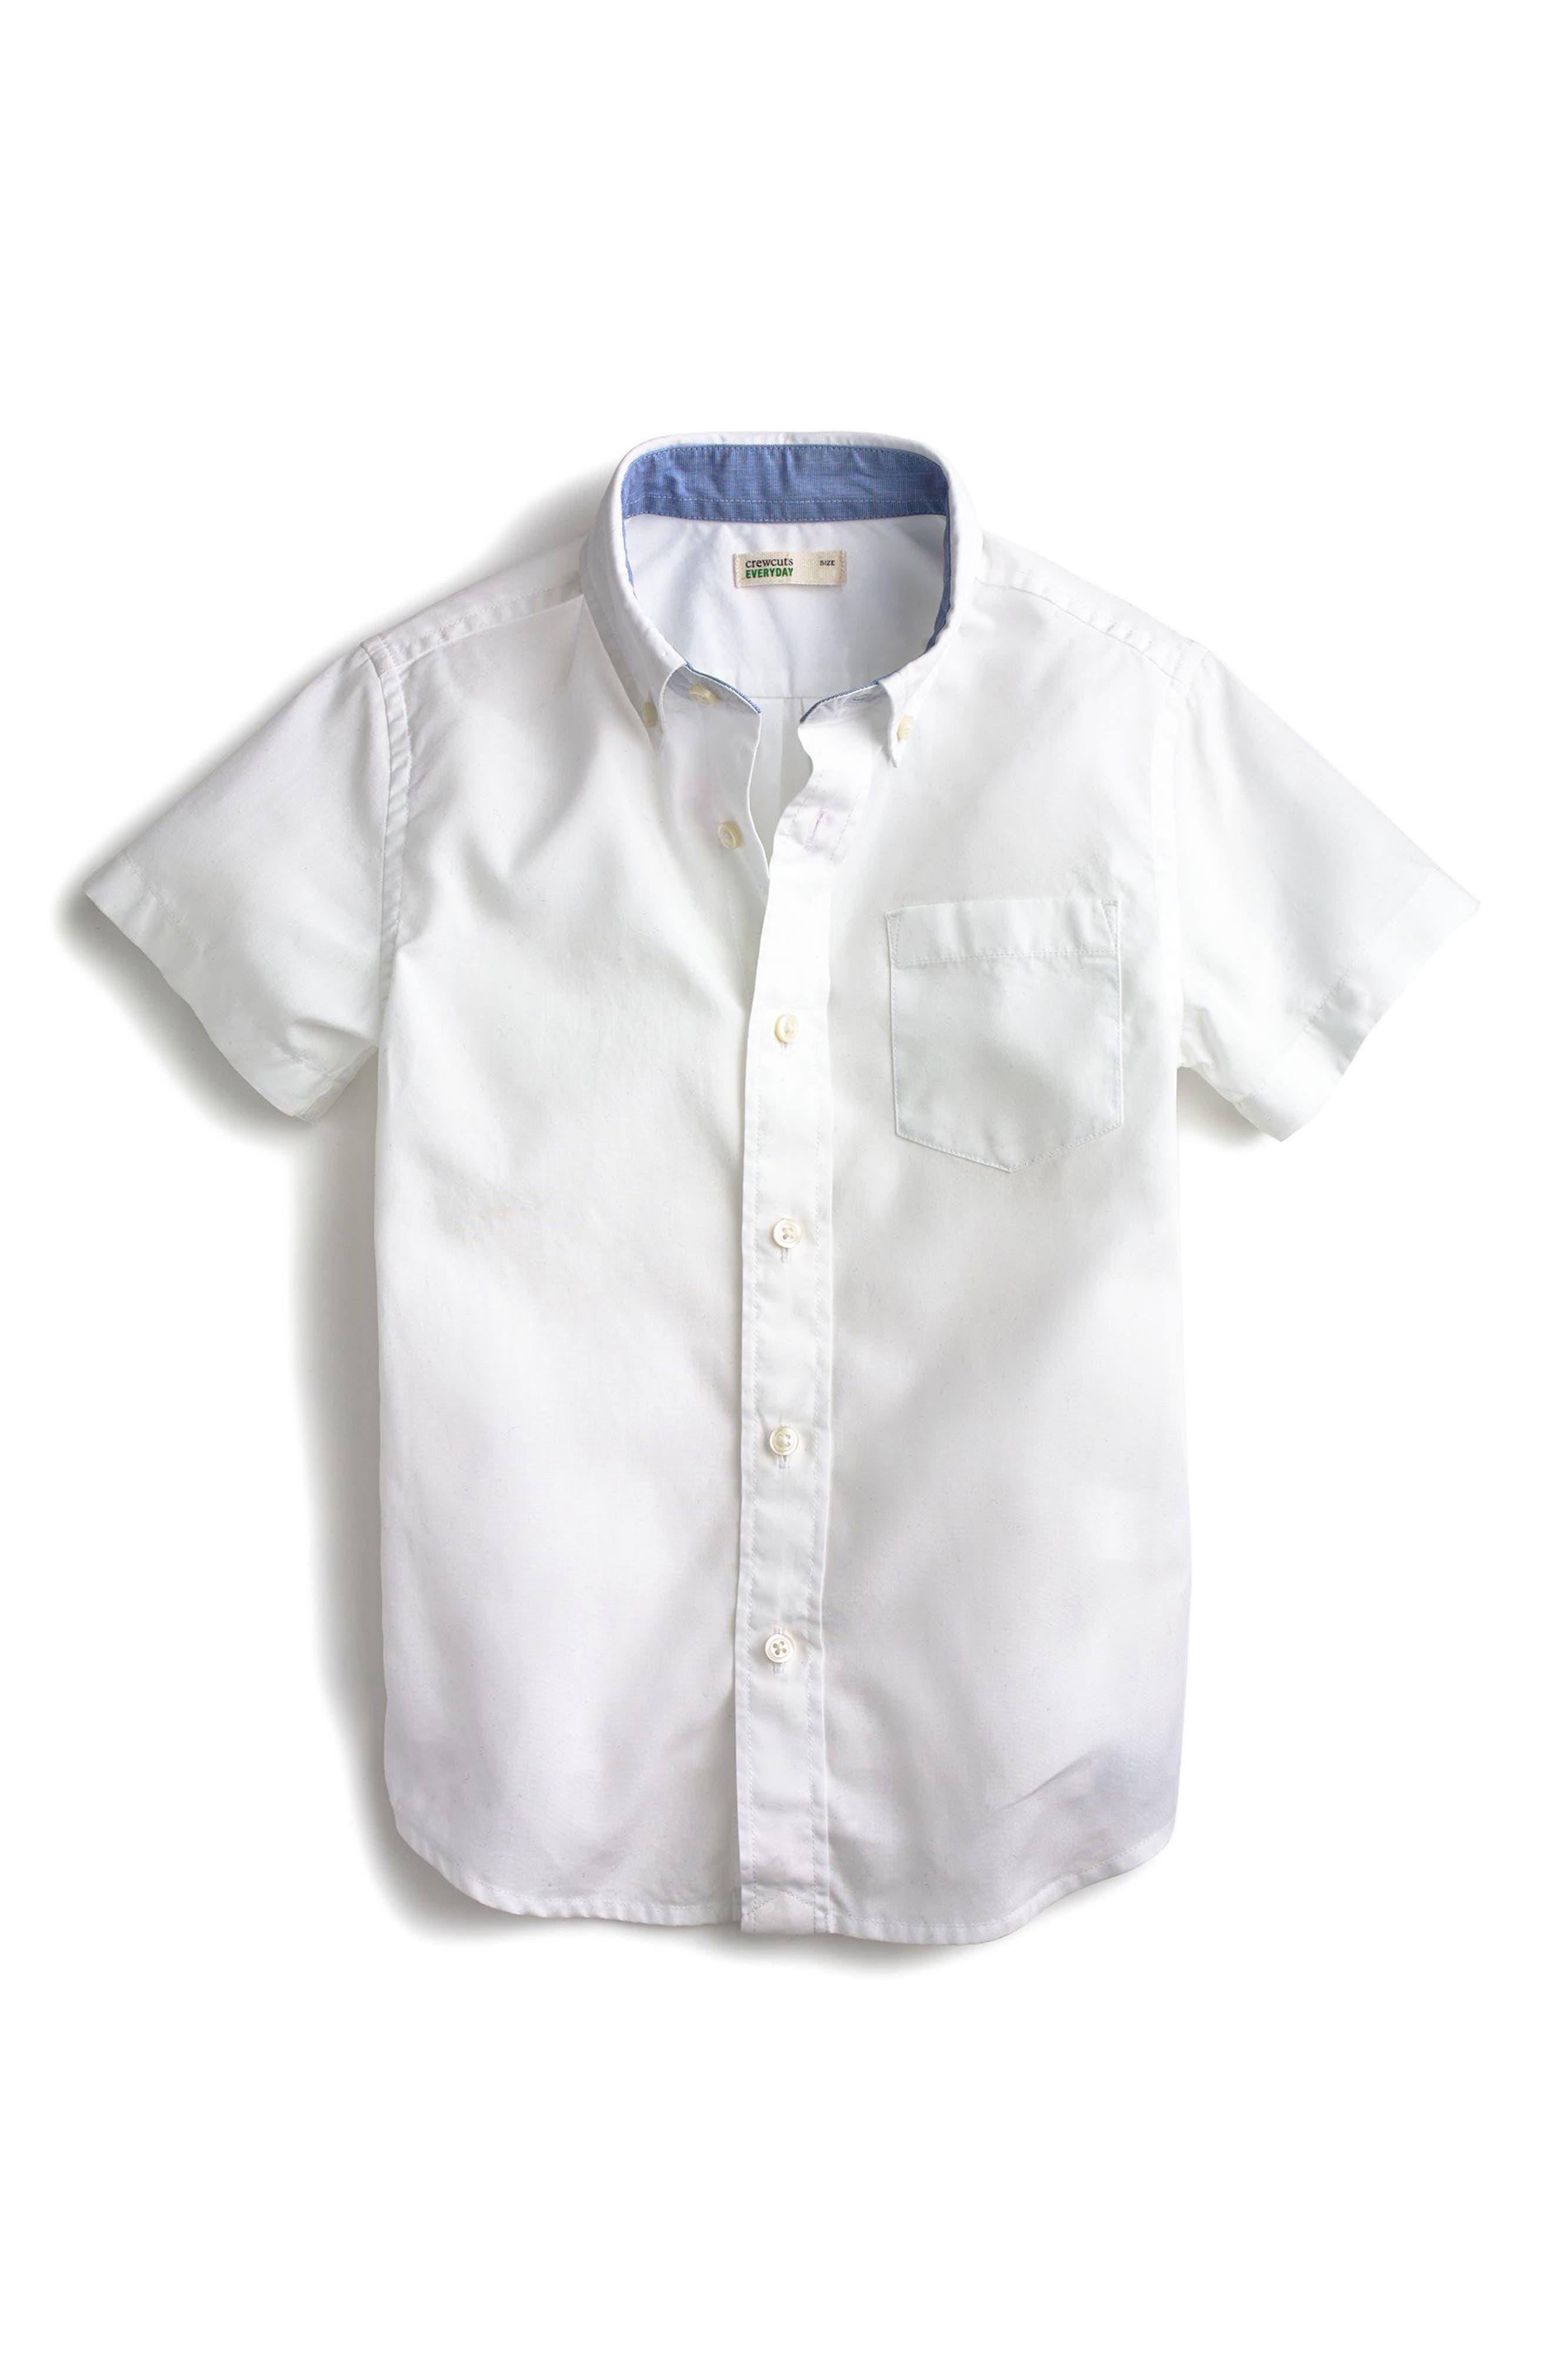 crewcuts by J.Crew Secret Wash Woven Shirt (Toddler Boys, Little Boys & Big Boys)